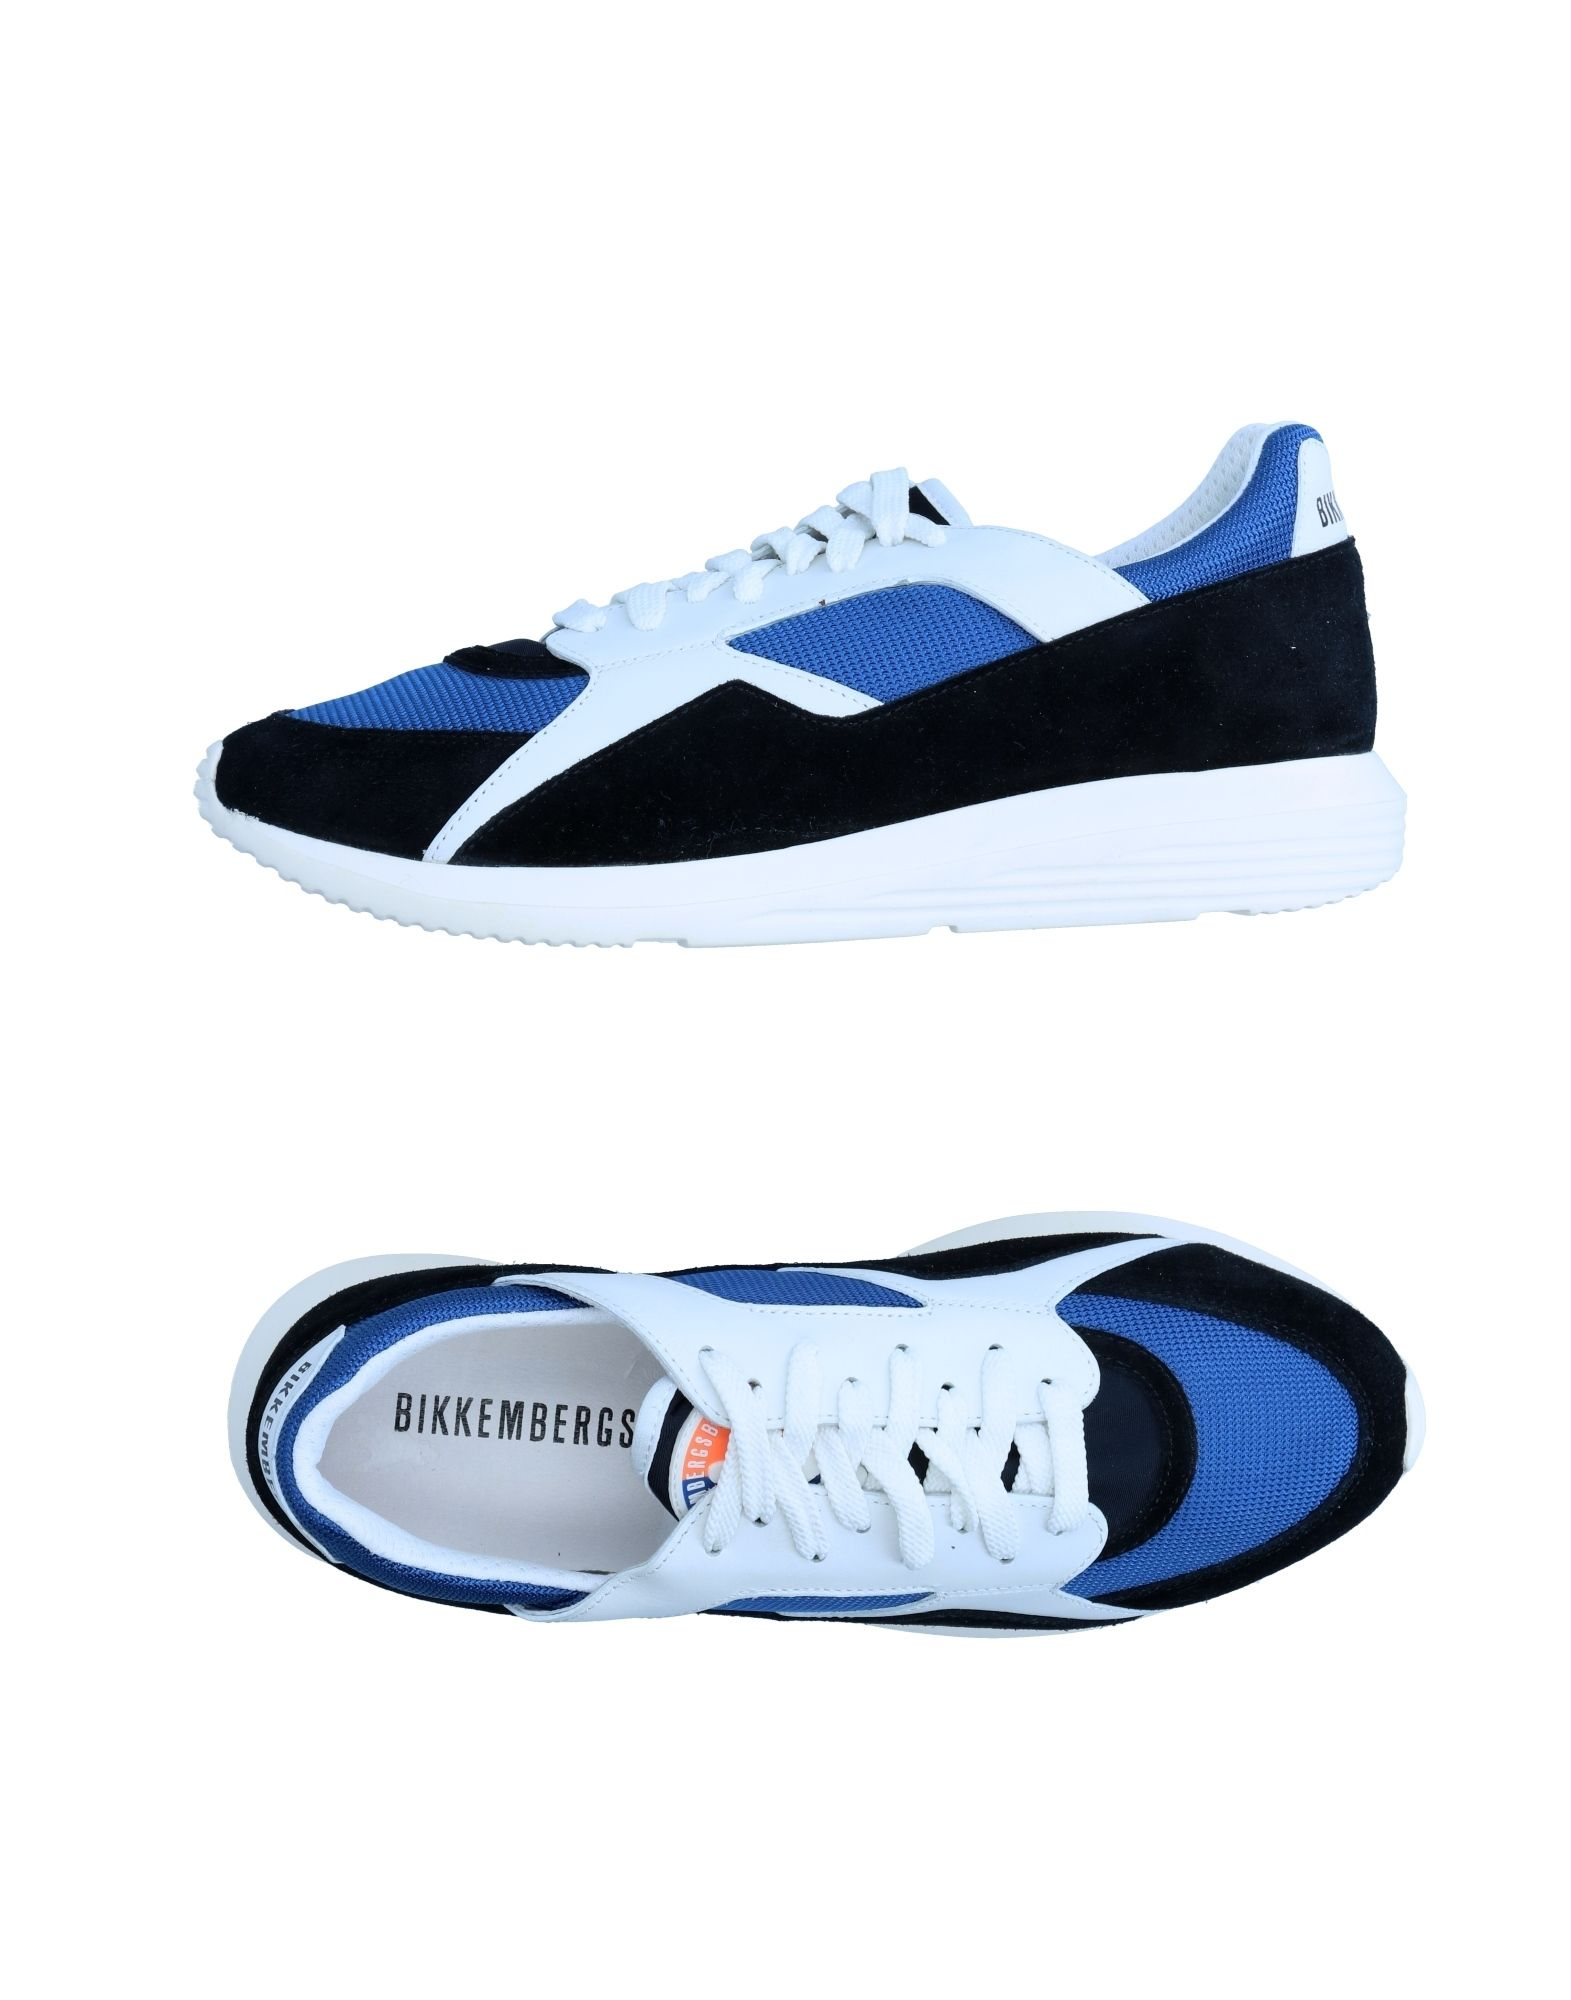 Rabatt echte Schuhe Herren Bikkembergs Sneakers Herren Schuhe  11232887LO 0b9e9a